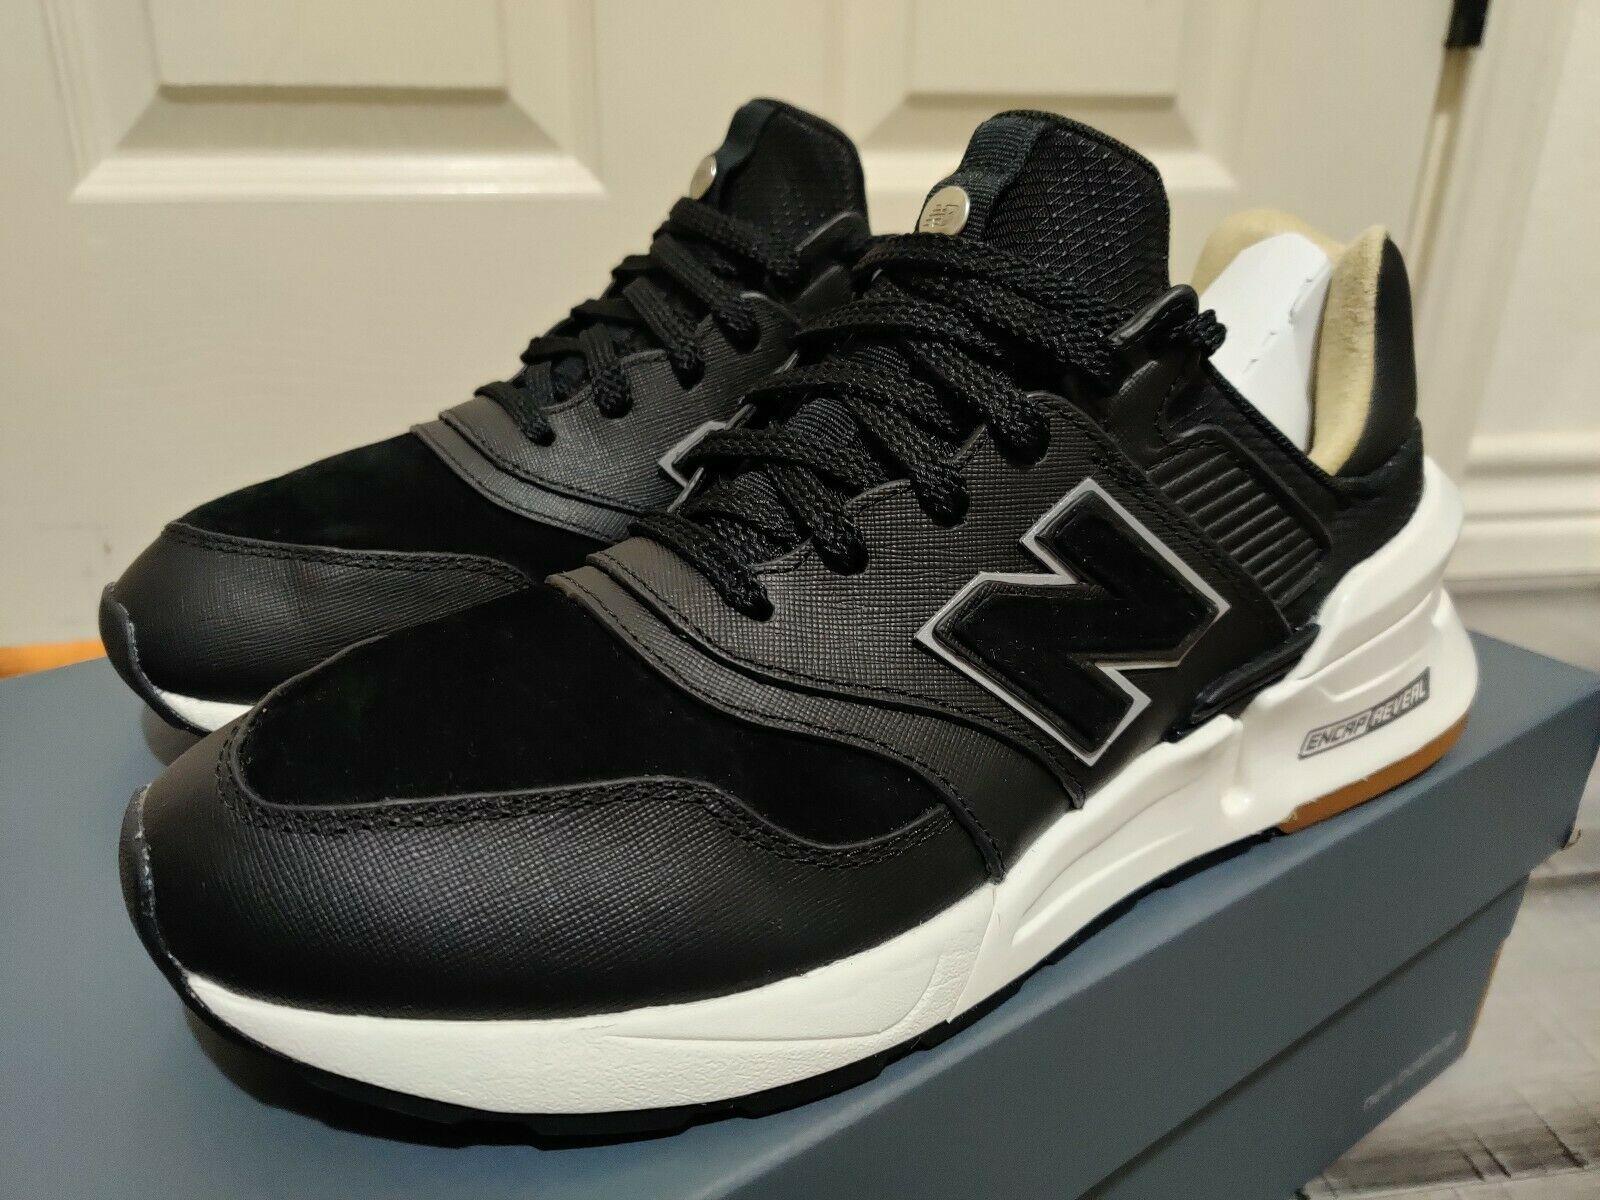 New Balance 997S Saffiano Leather Black